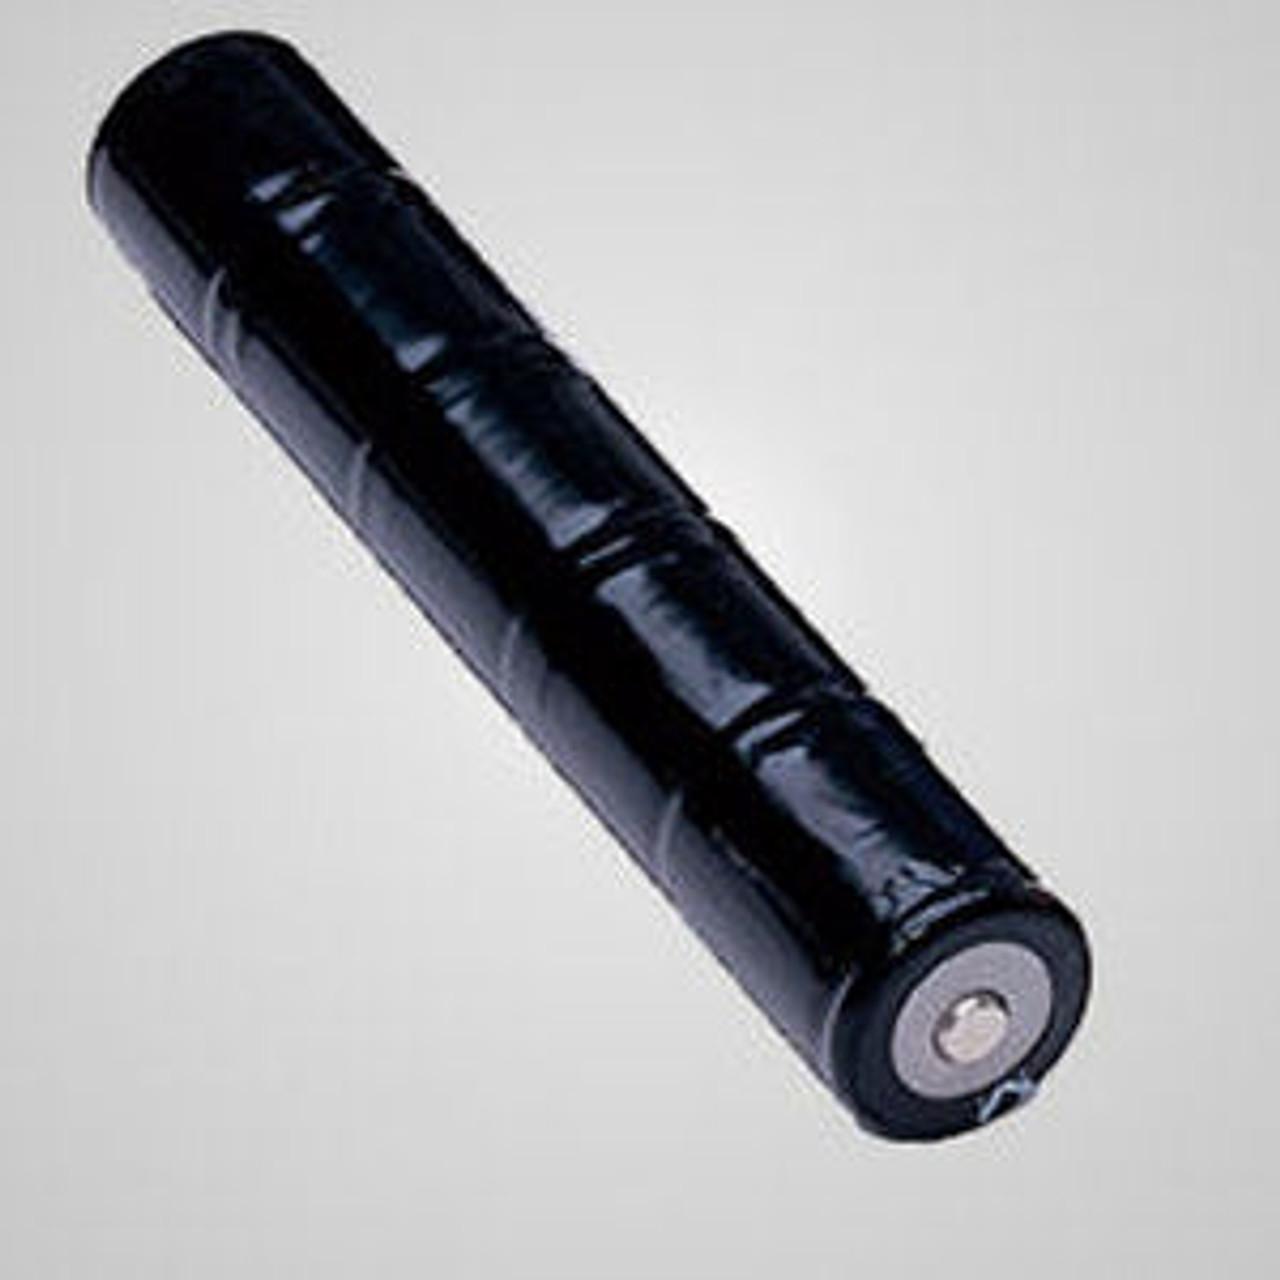 Maglite Magcharger Battery - 3500mAh Ni-MH